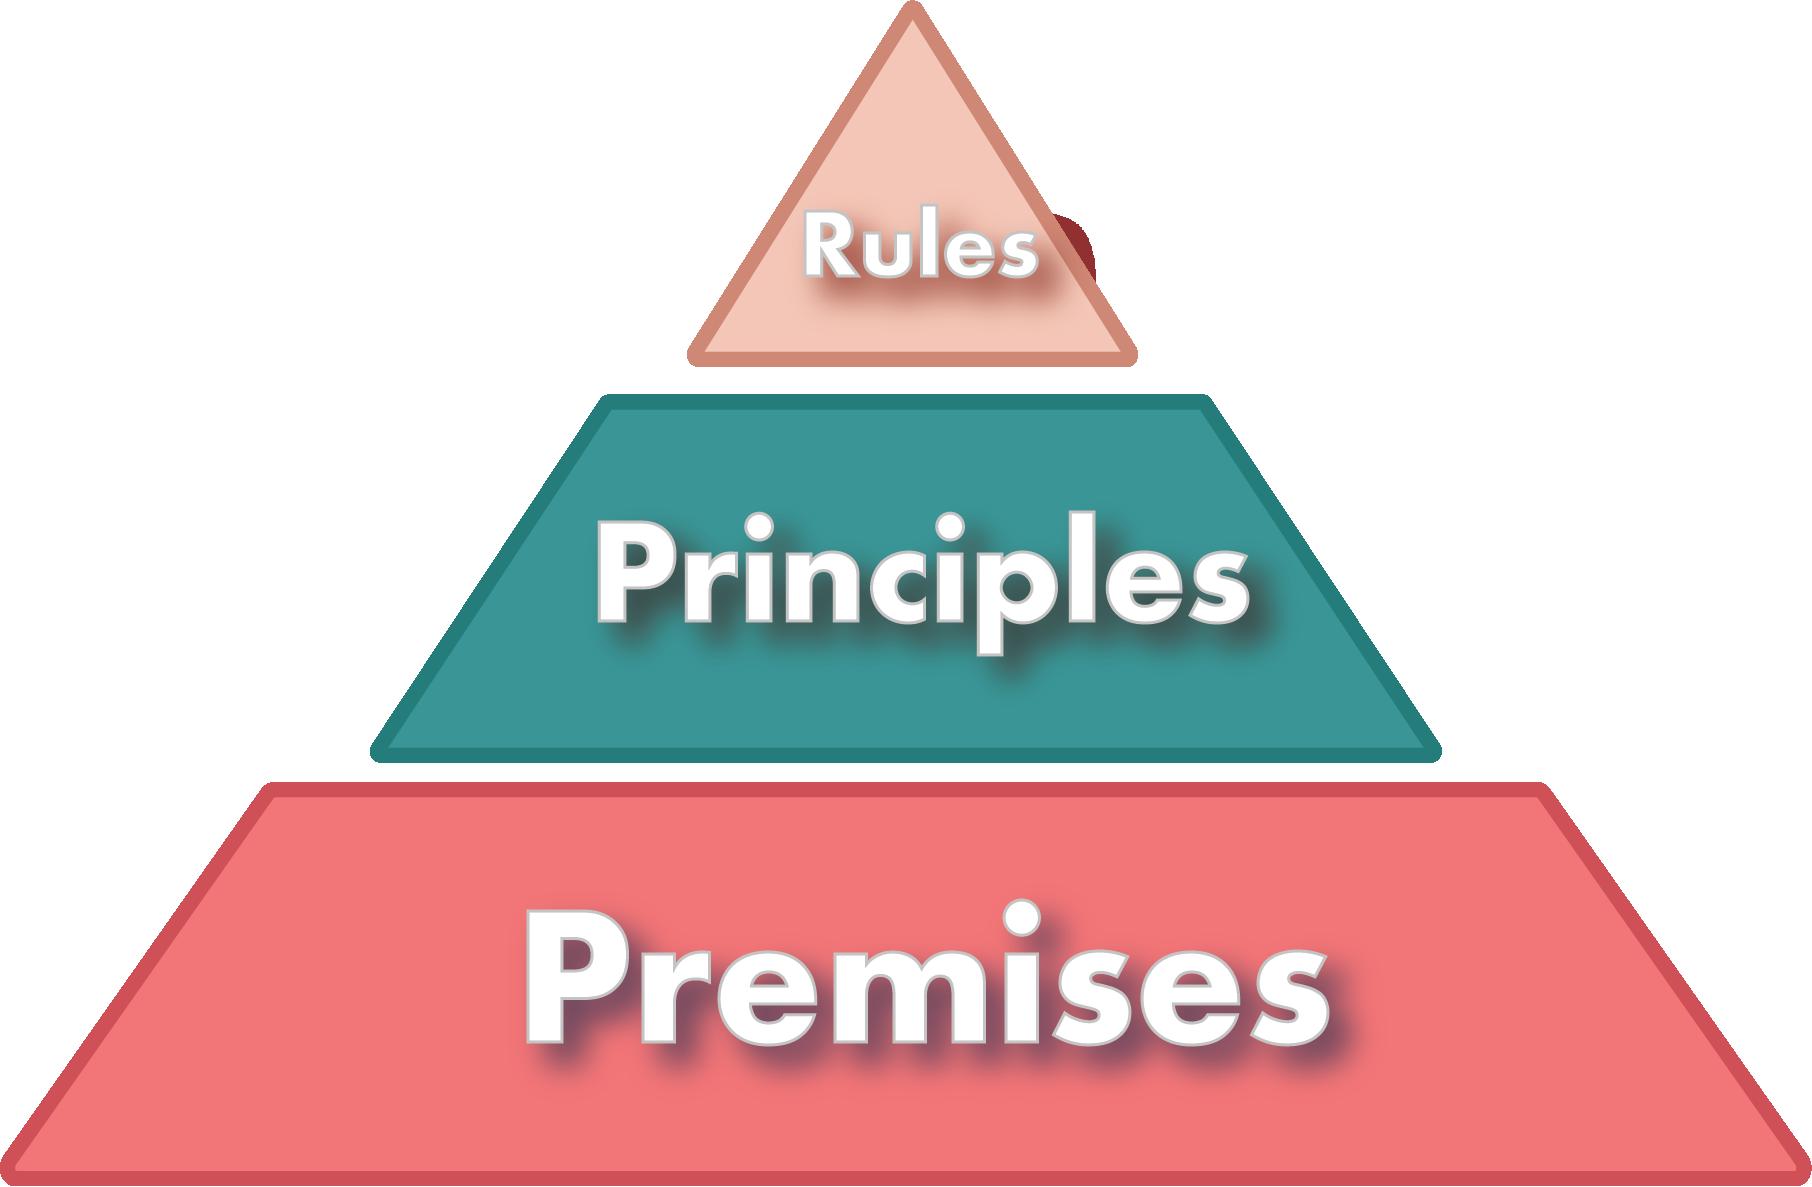 rules, principles, premises pyramid